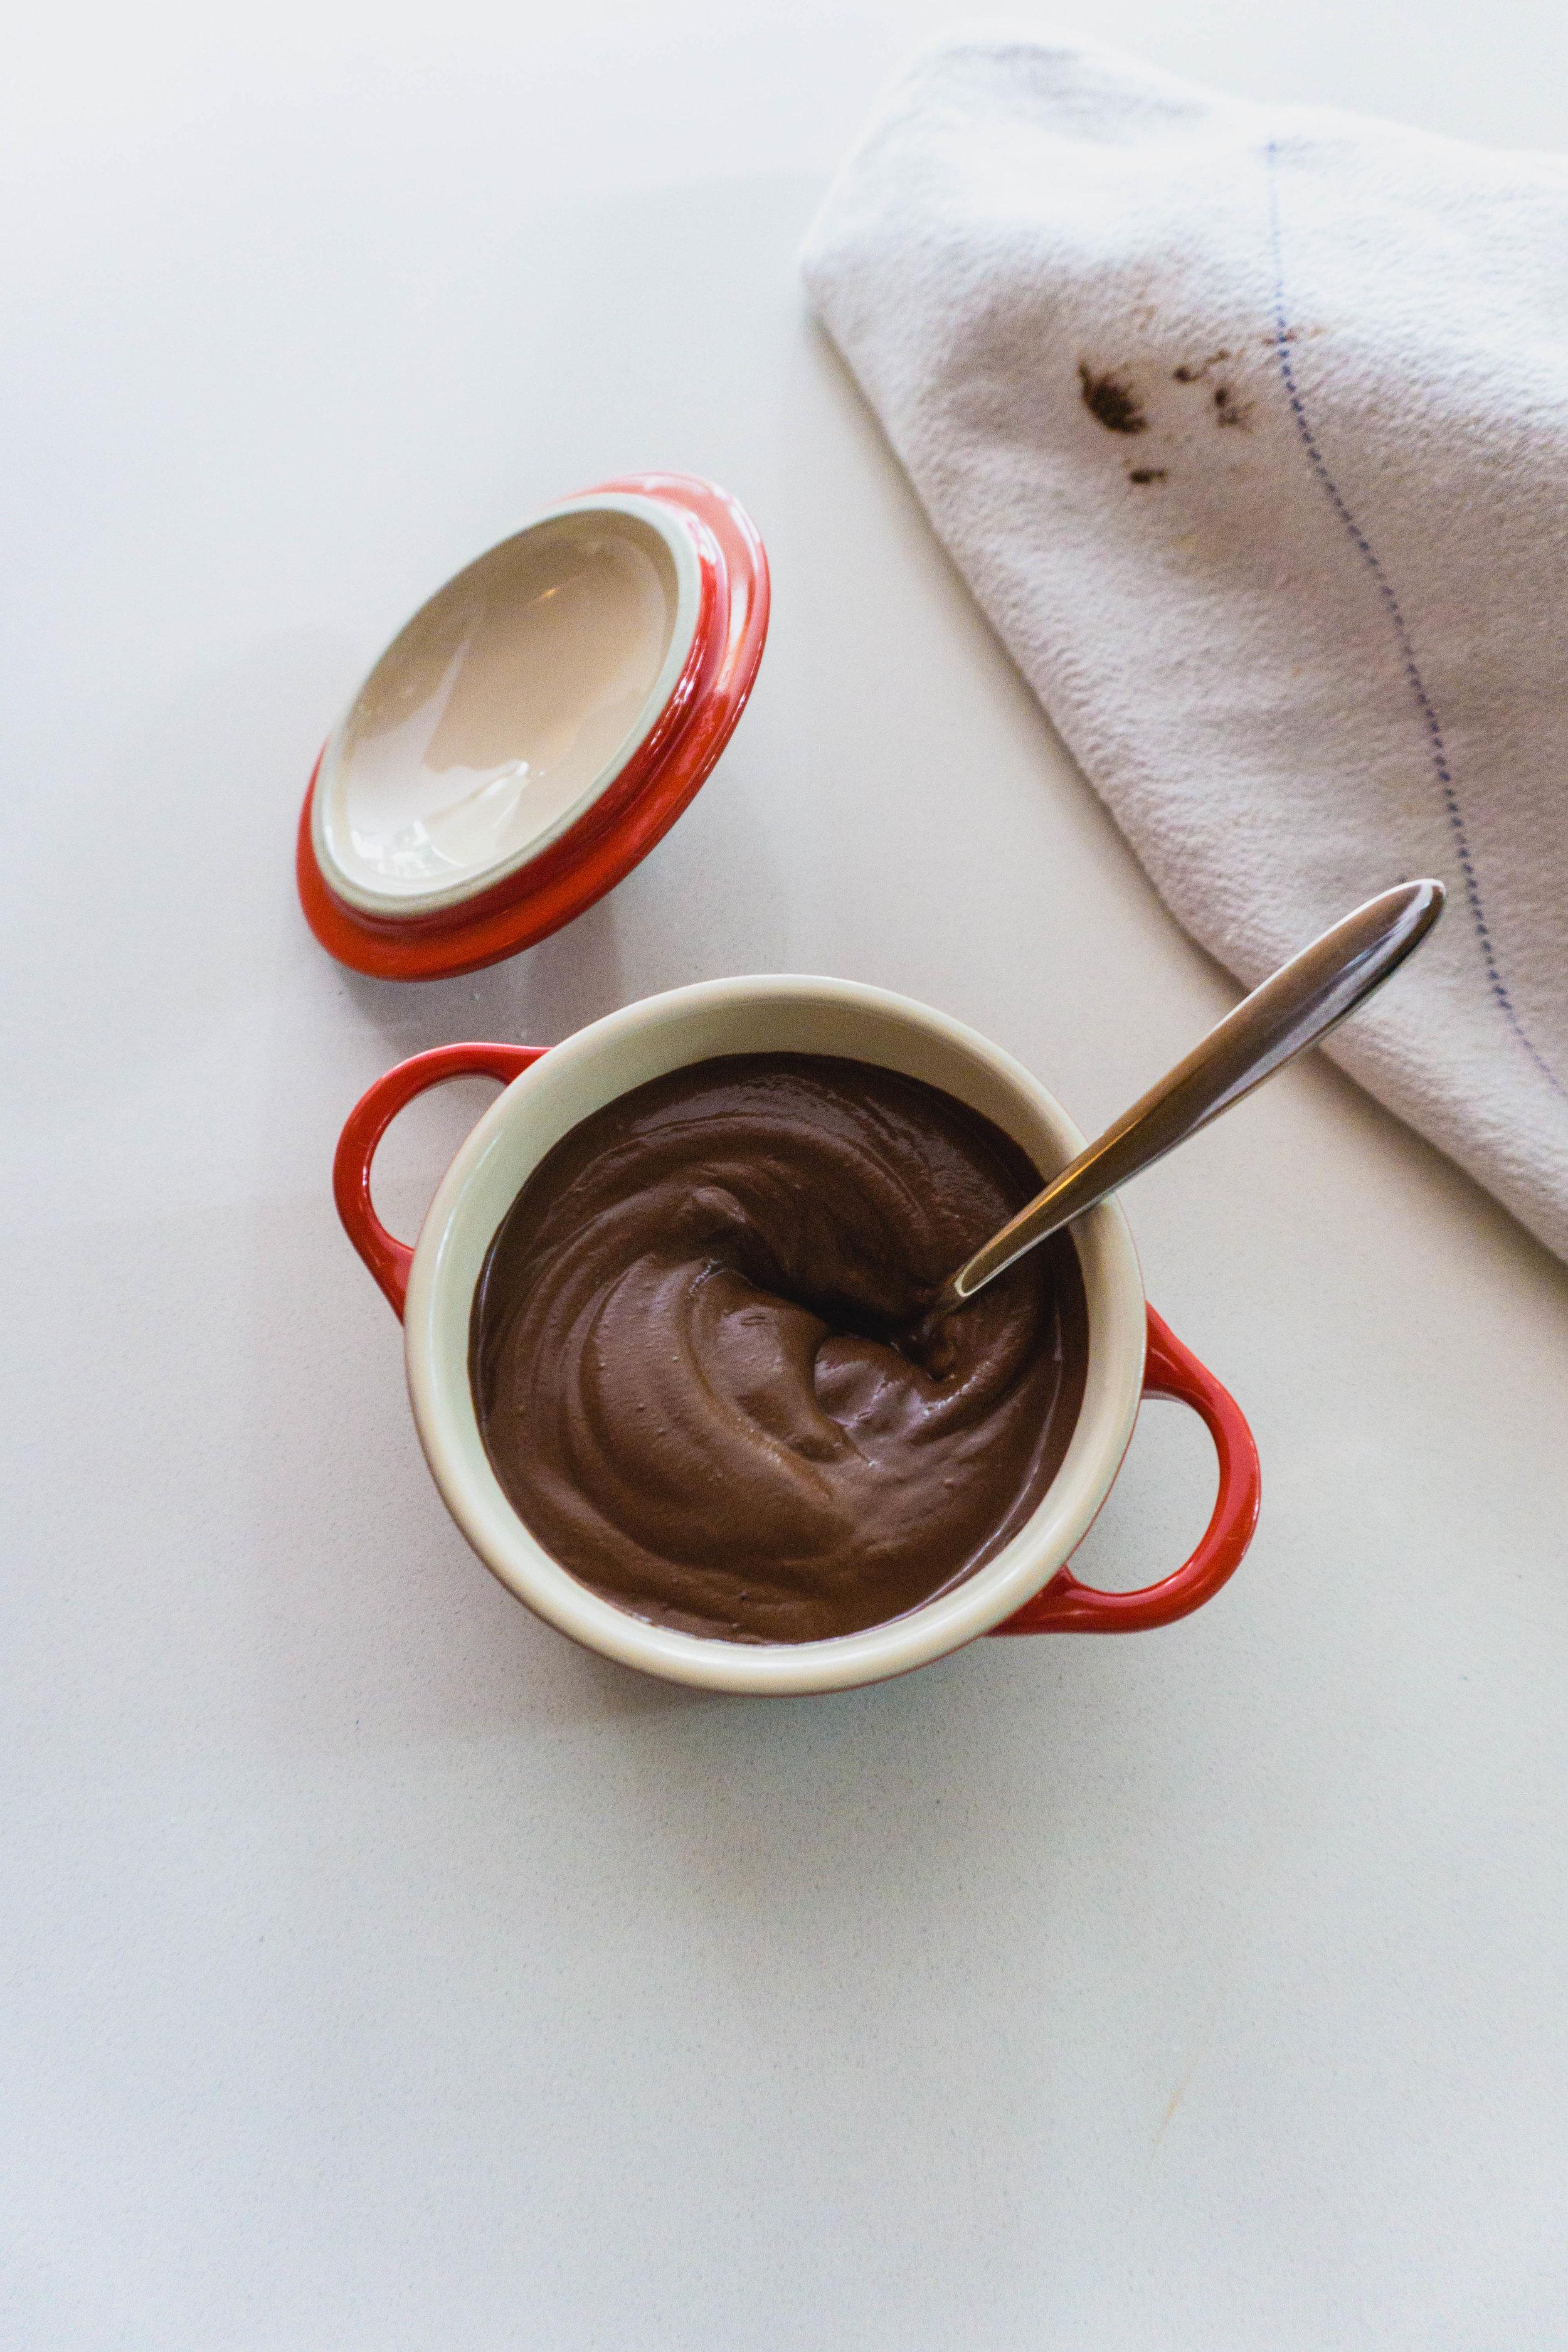 Chocolate swirls and stains